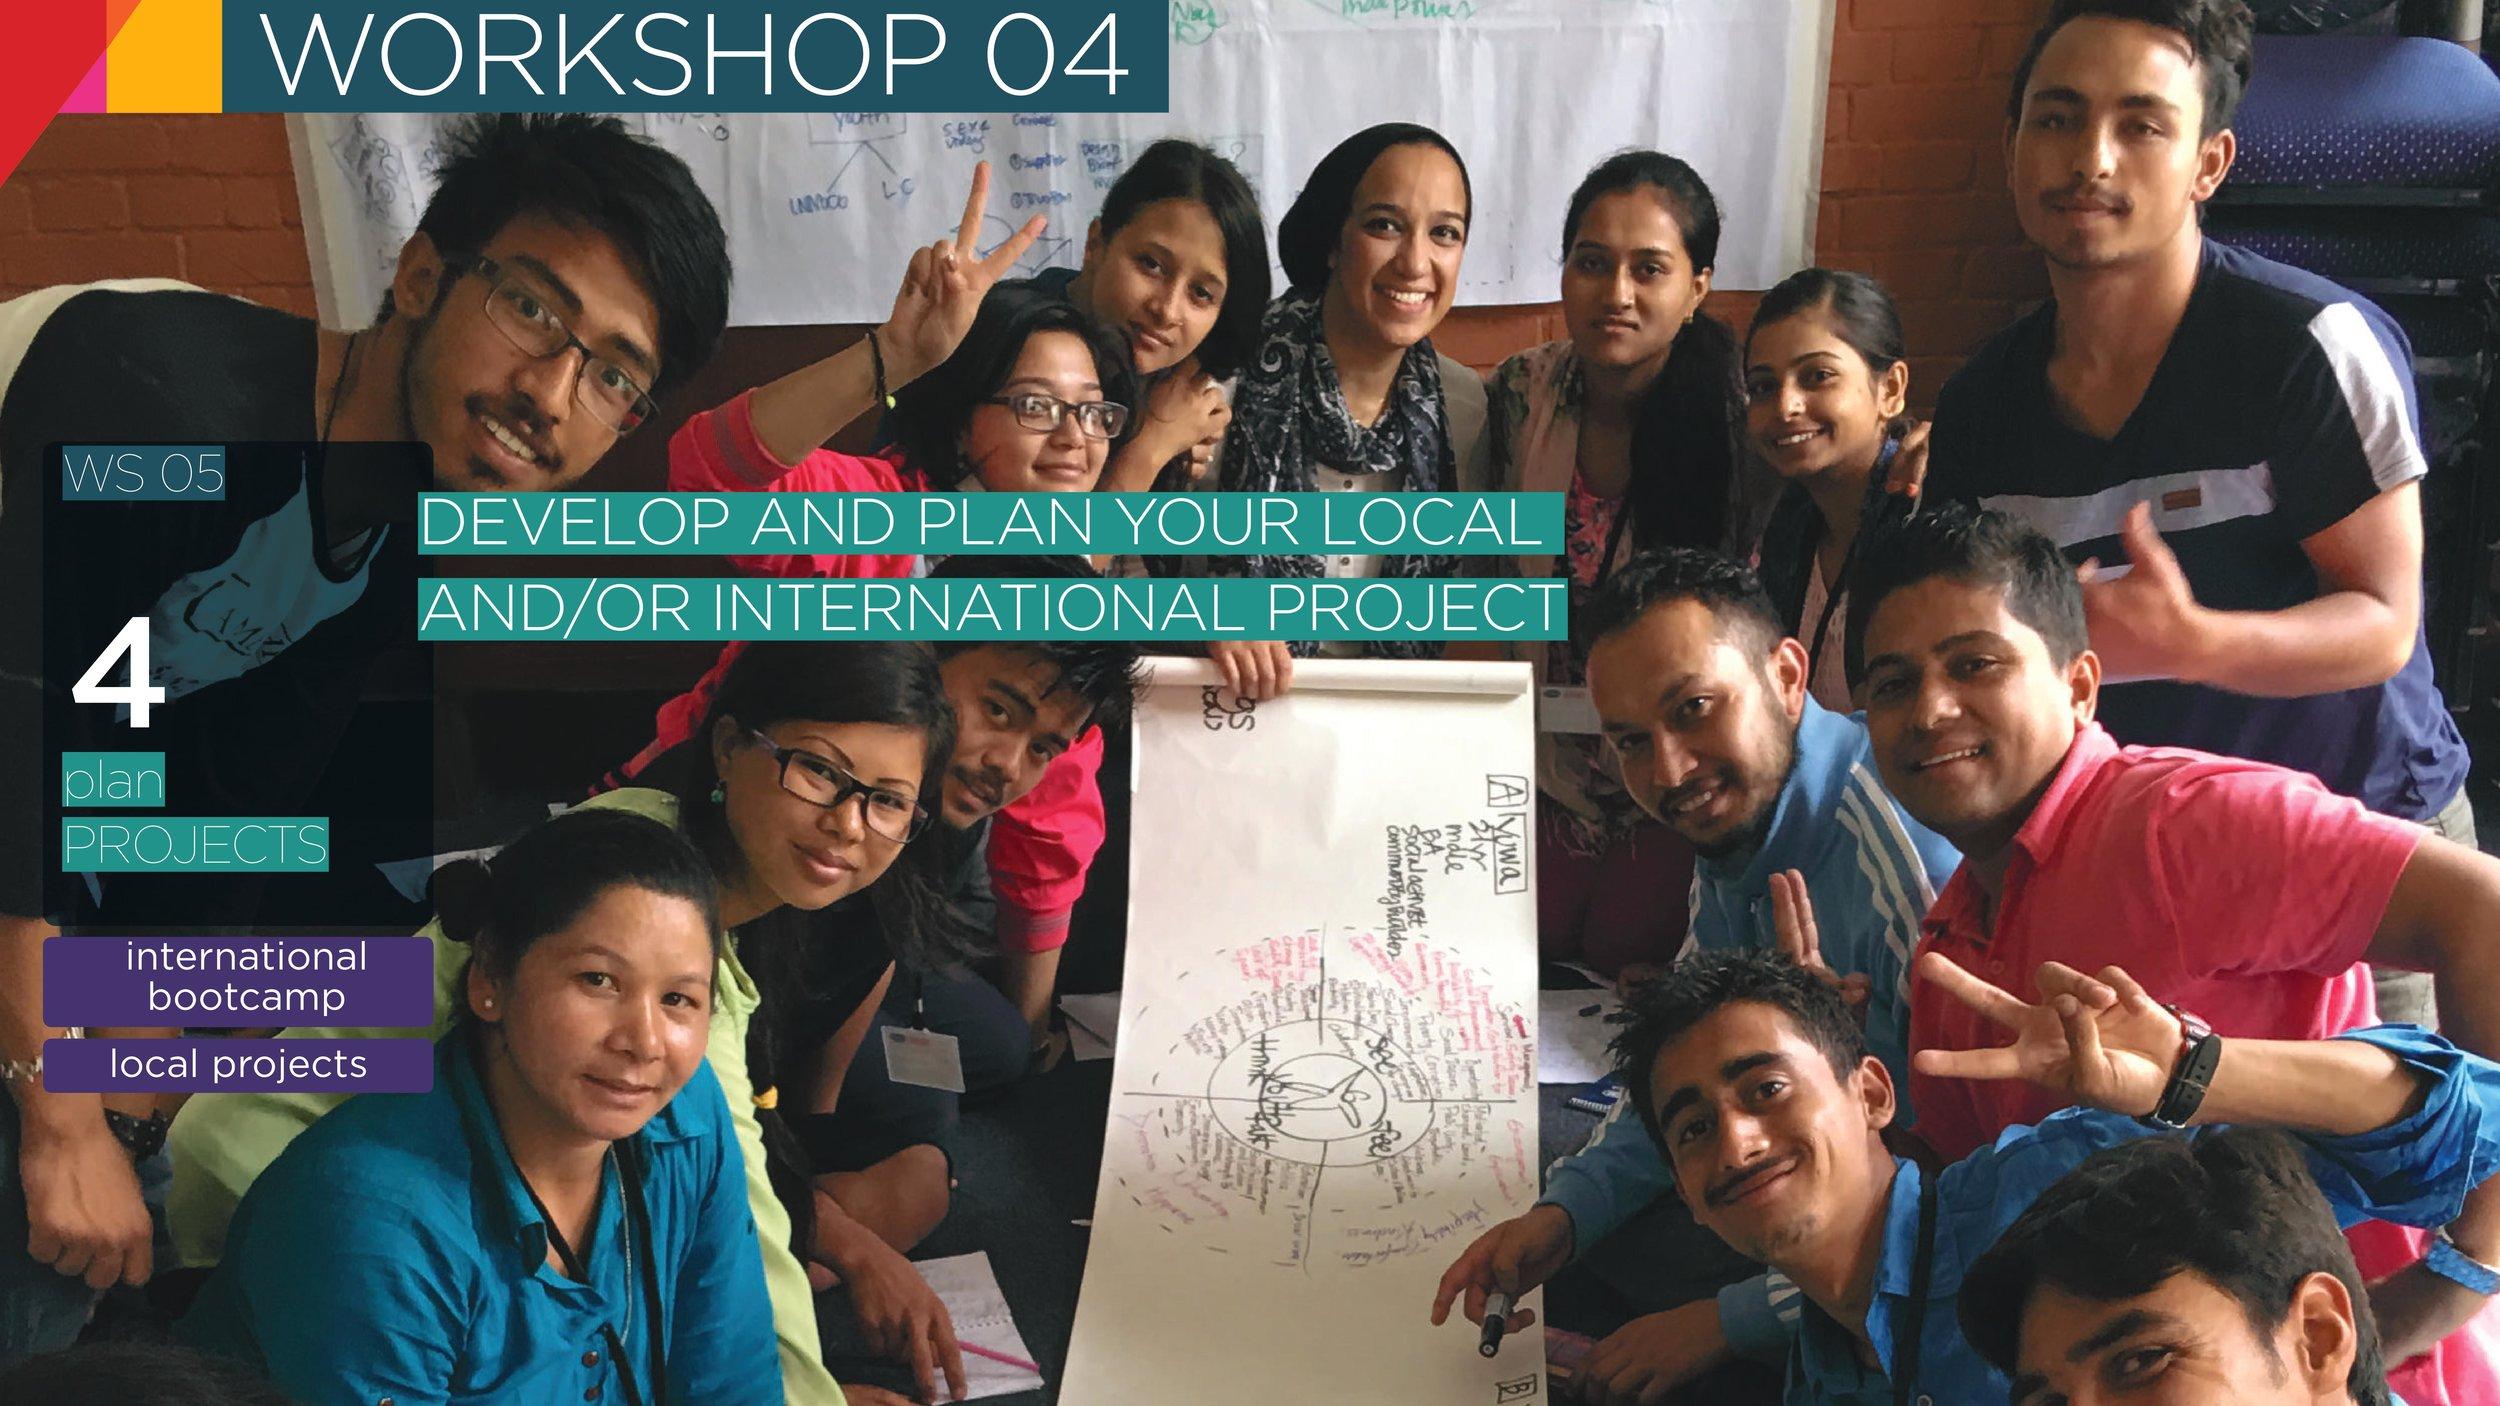 Workshop 04